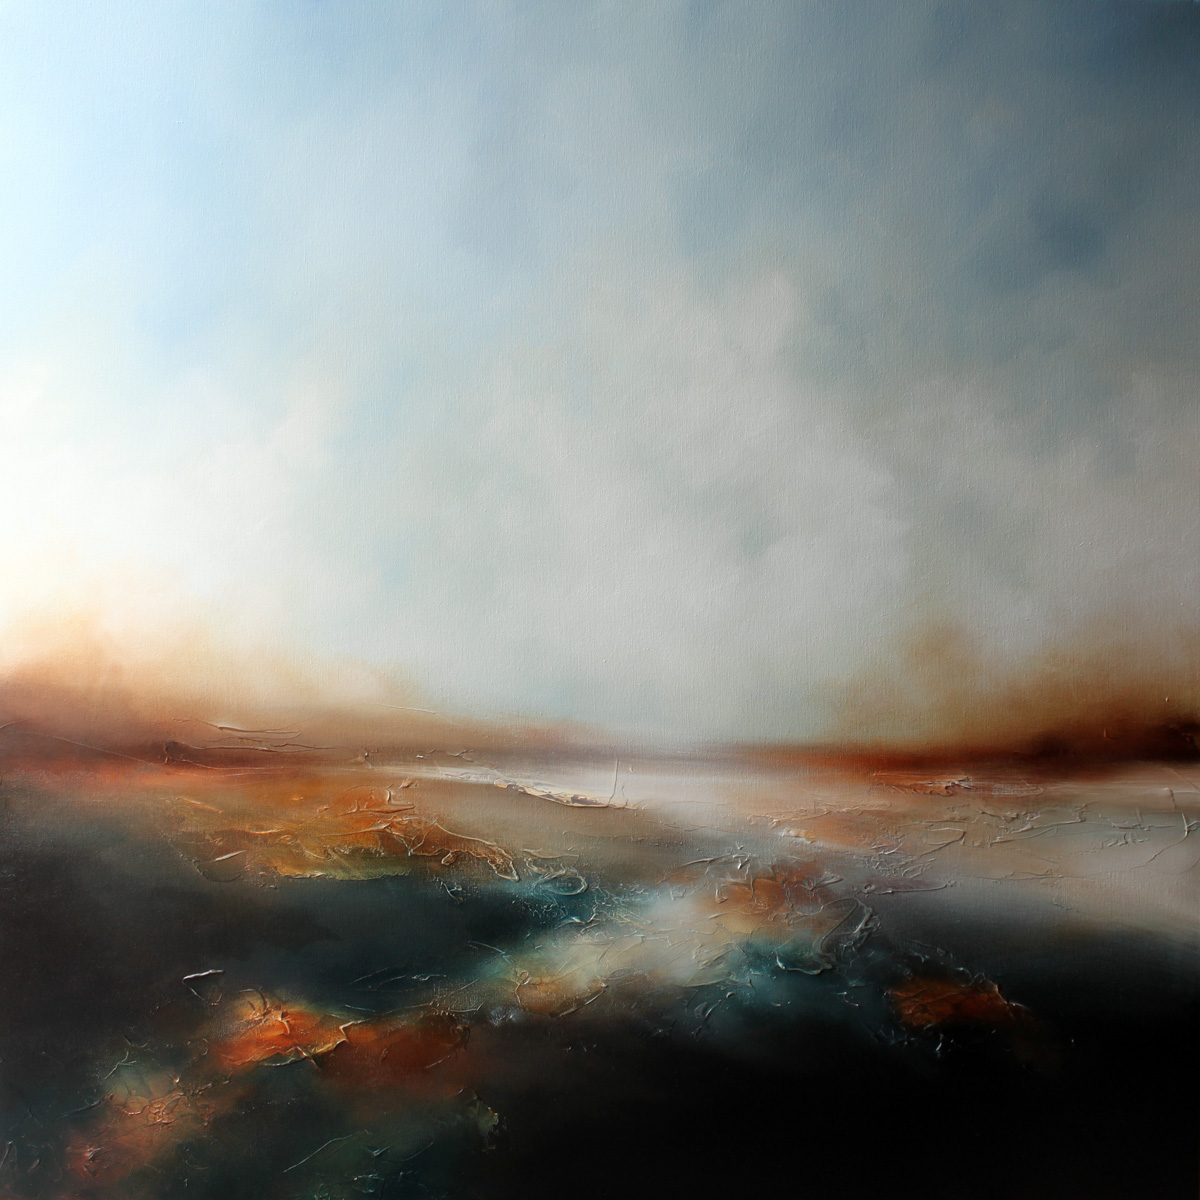 Now Til Never Seascape and Landscape Painting